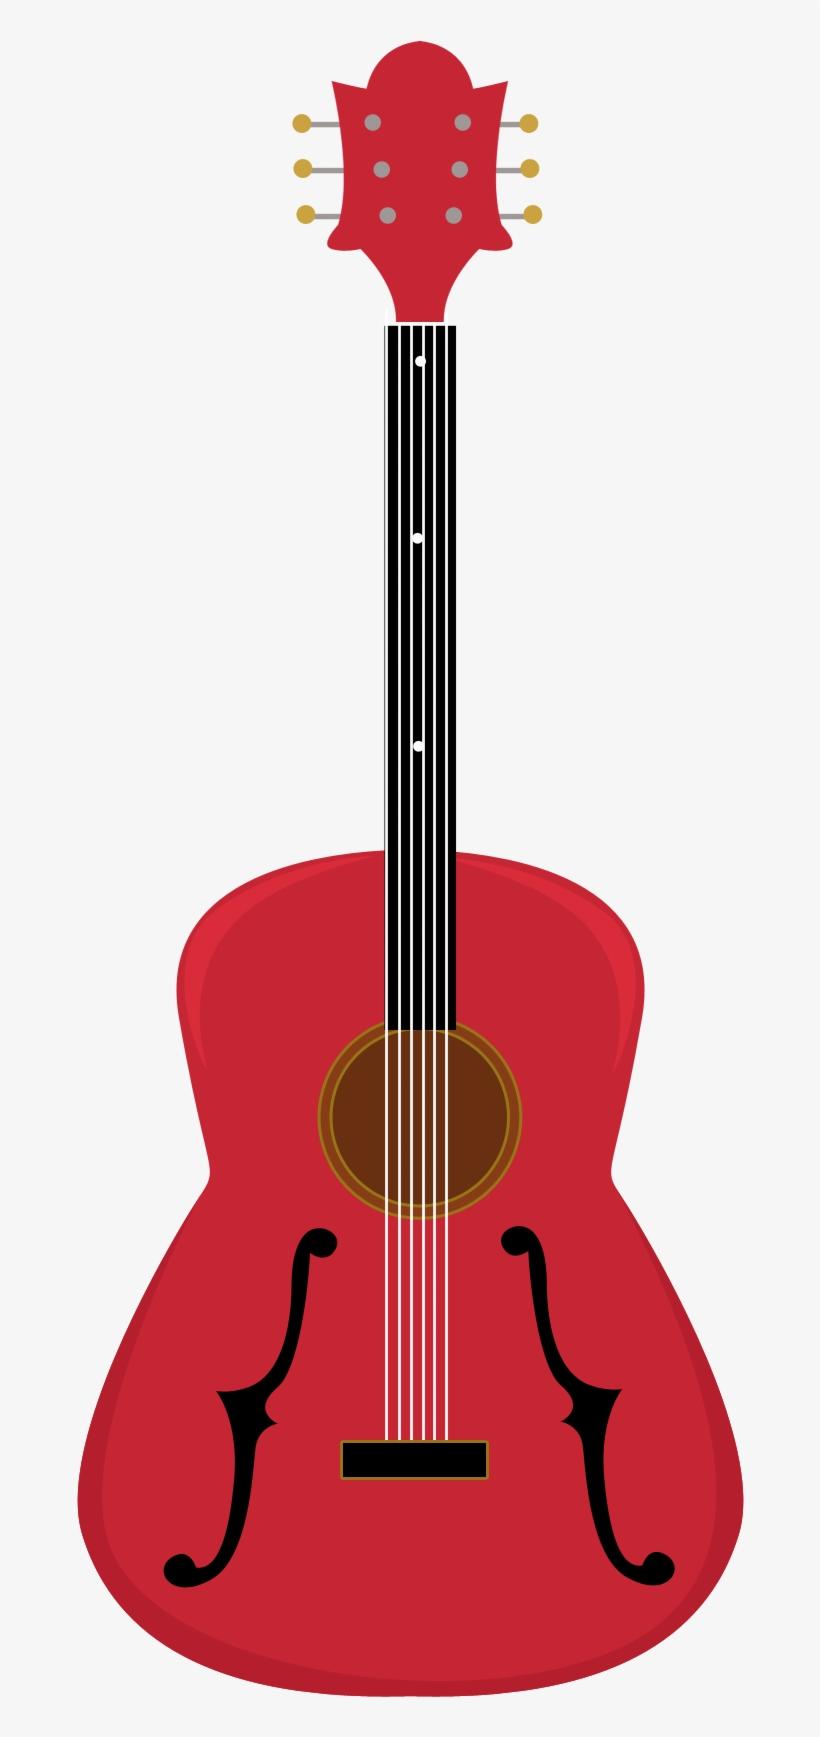 Air guitar clipart vector free download Musician Clipart Air Guitar - Pink Guitar Clipart - Free Transparent ... vector free download